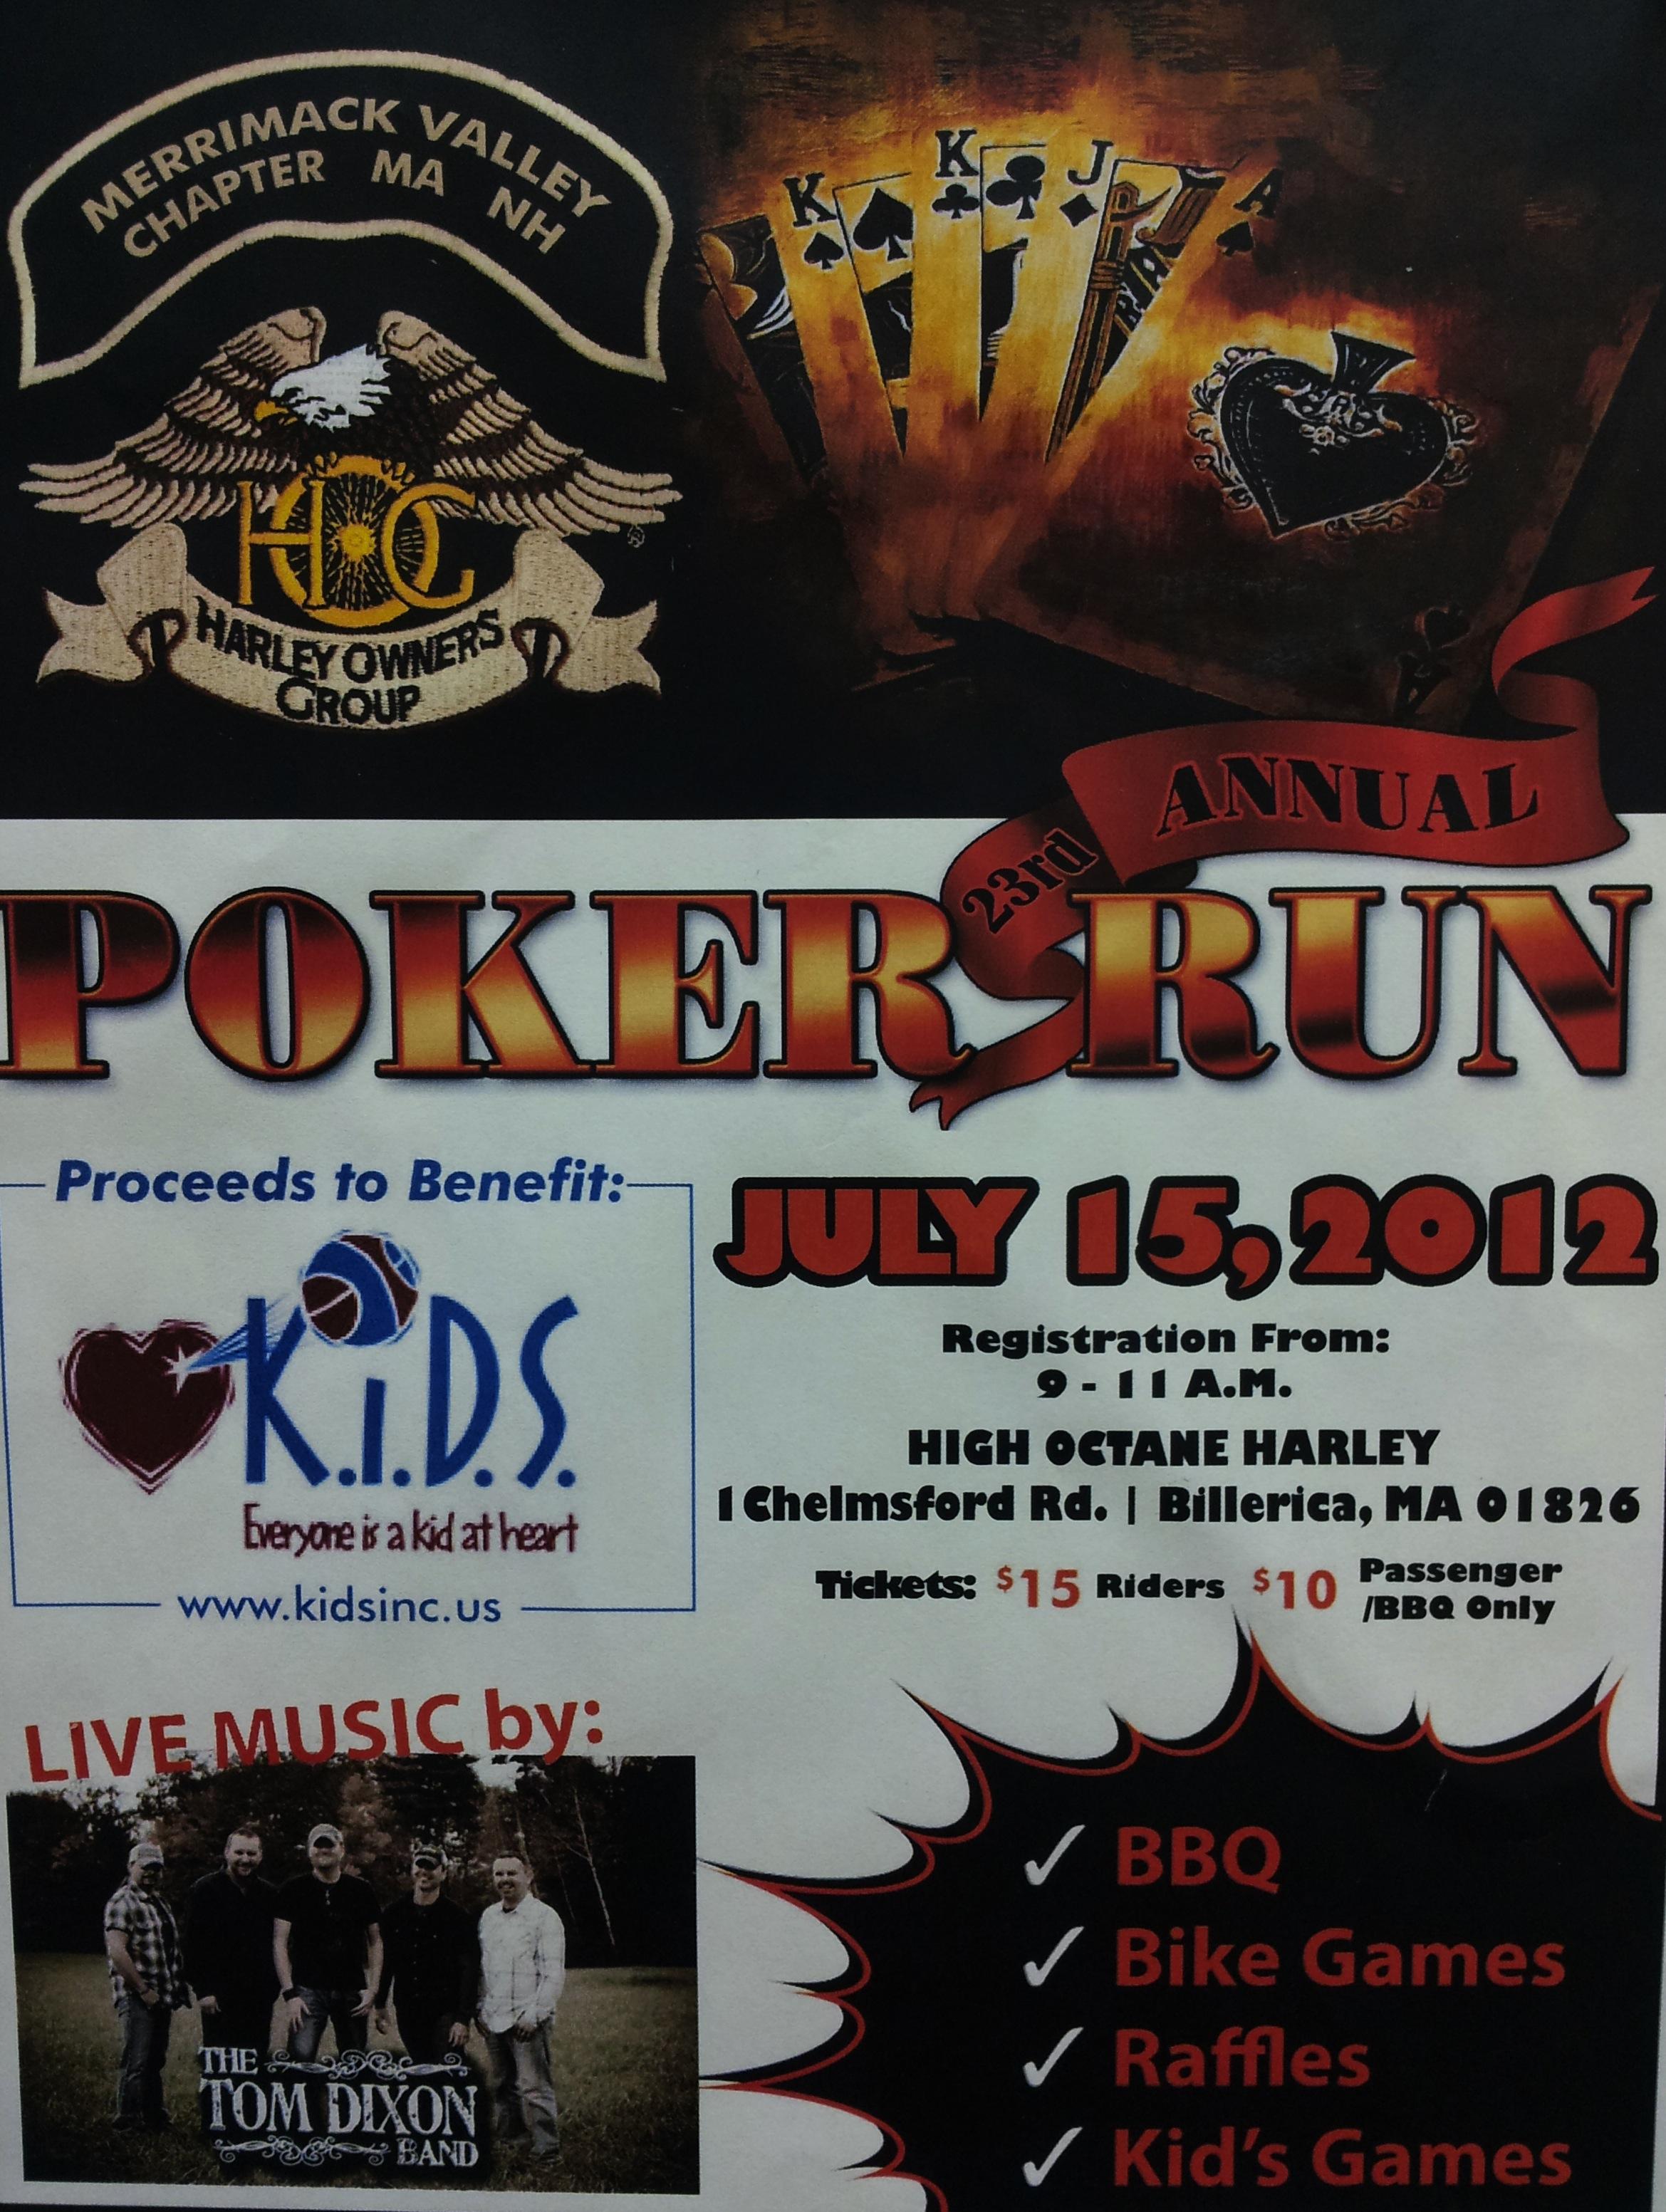 Boston poker events